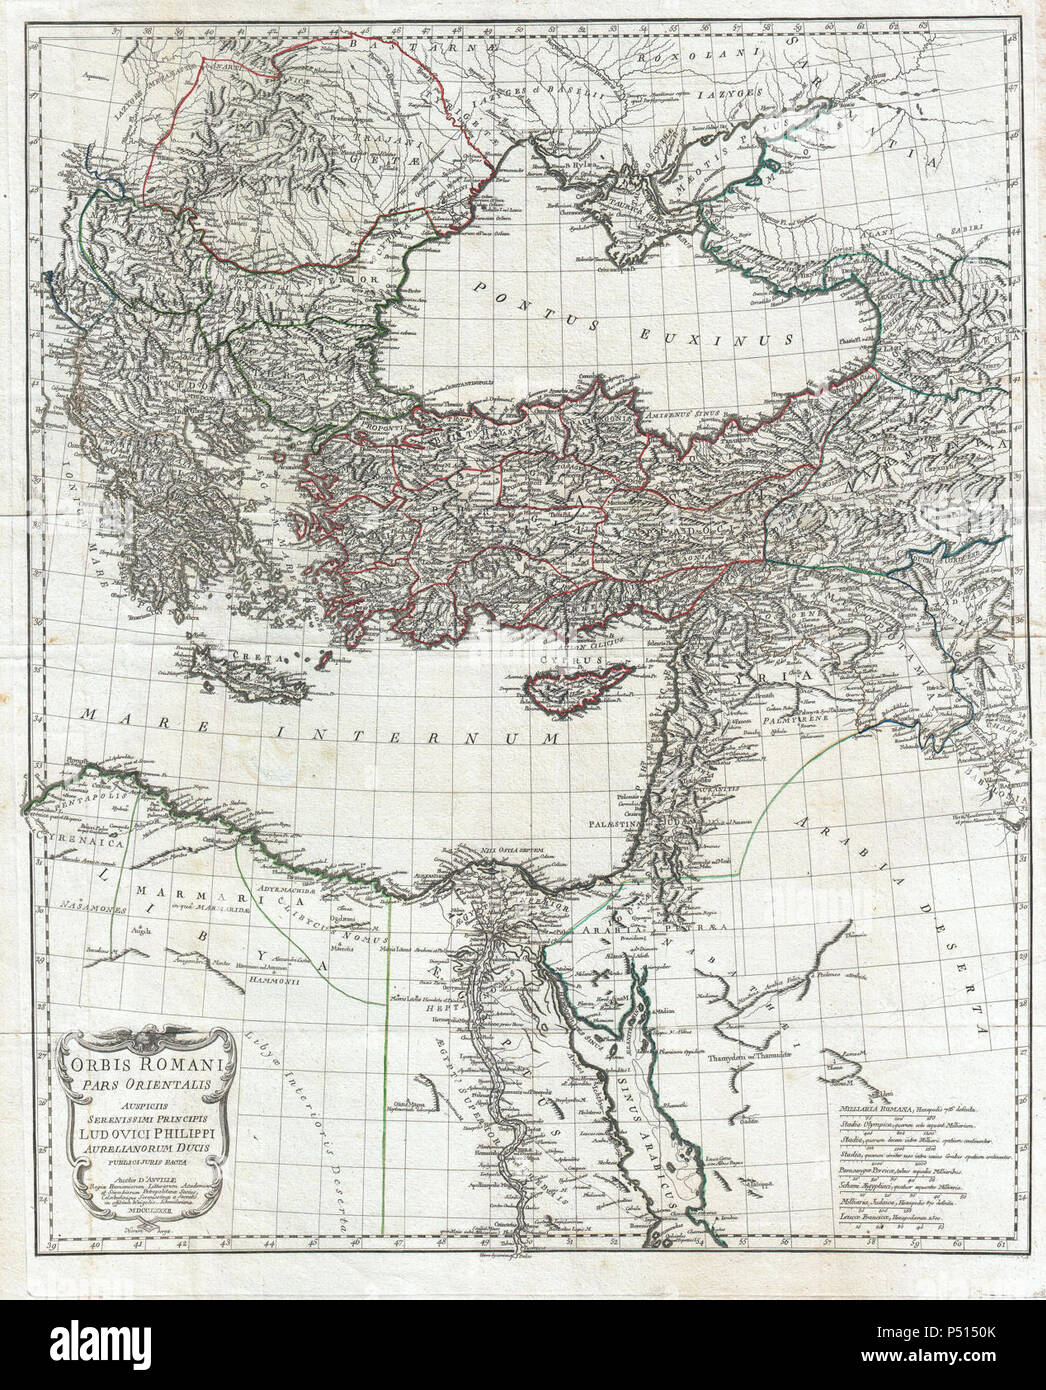 1782 La carte d'Anville de l'Empire romain - Geographicus - RomanEmpireEast-anville-1782. Photo Stock